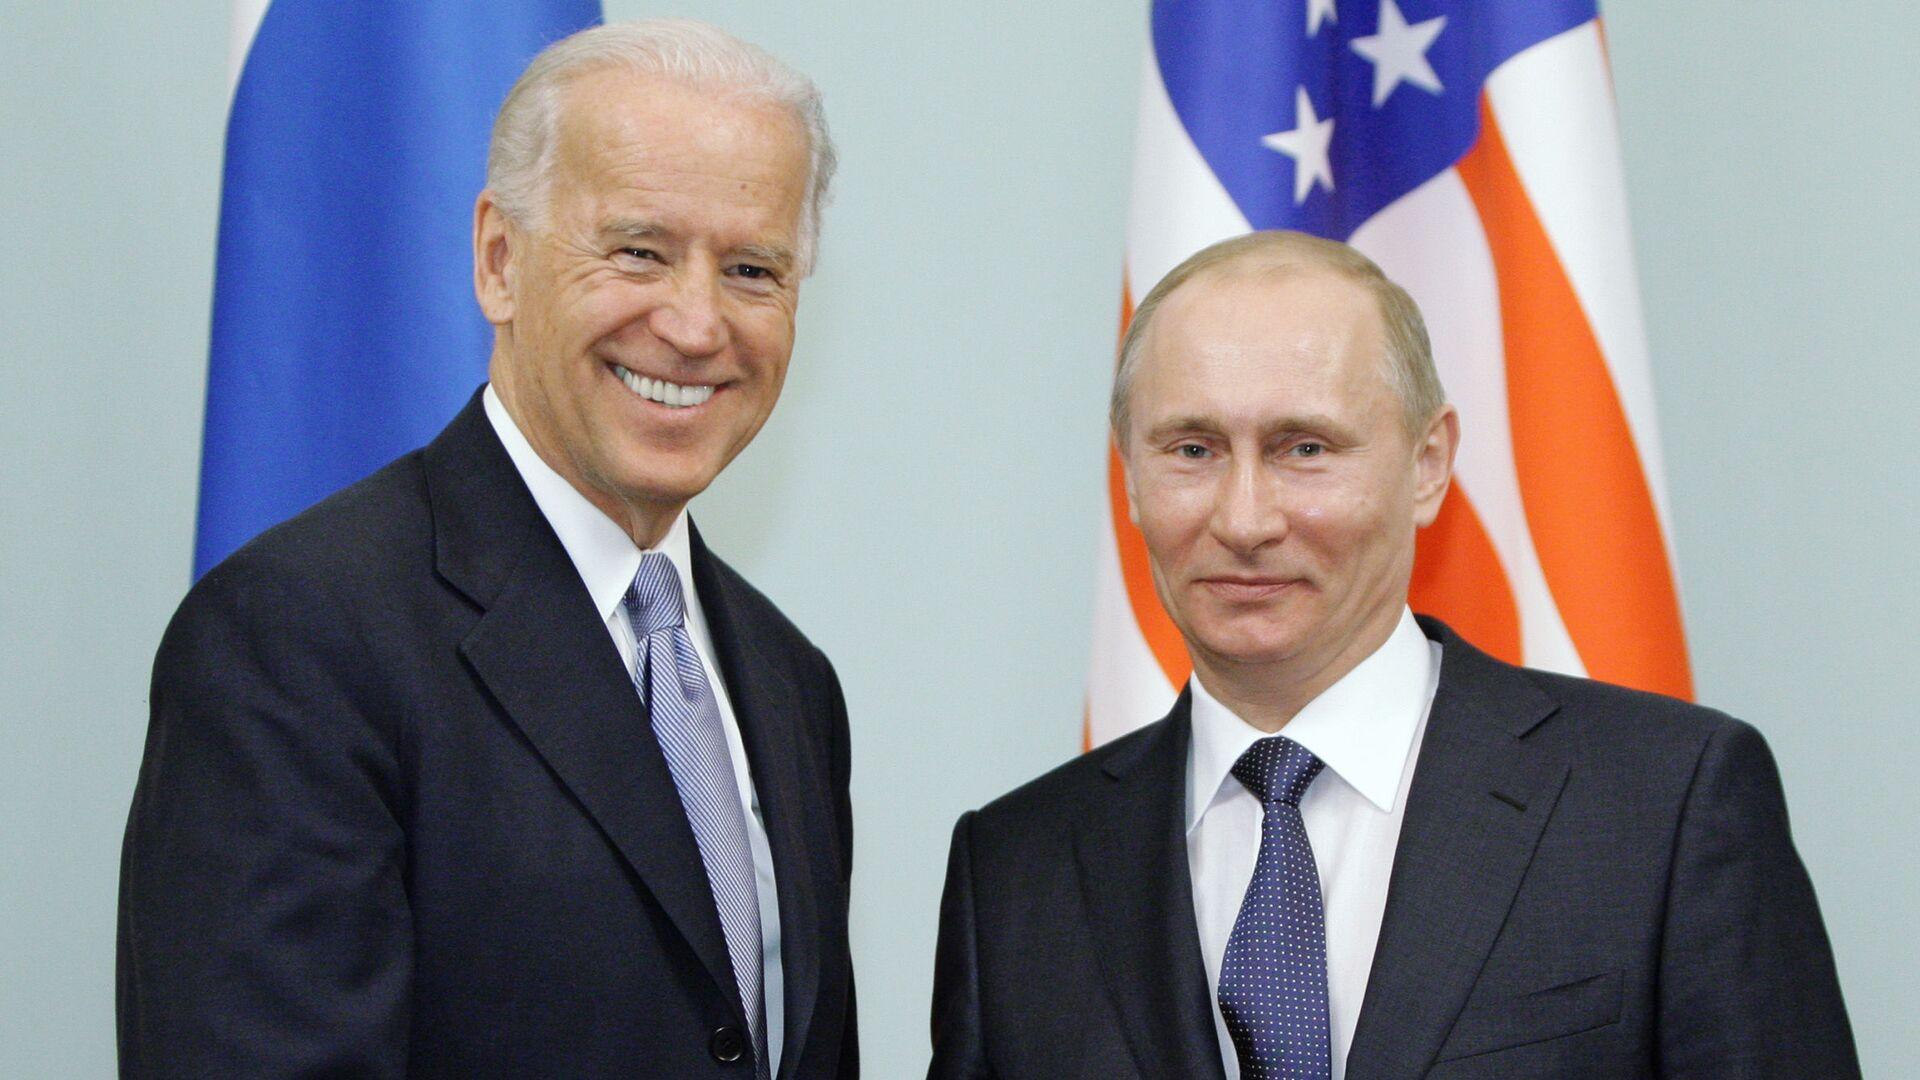 Joe Biden y Vladímir Putin en Rusia (archivo, año 2011) - Sputnik Mundo, 1920, 17.04.2021